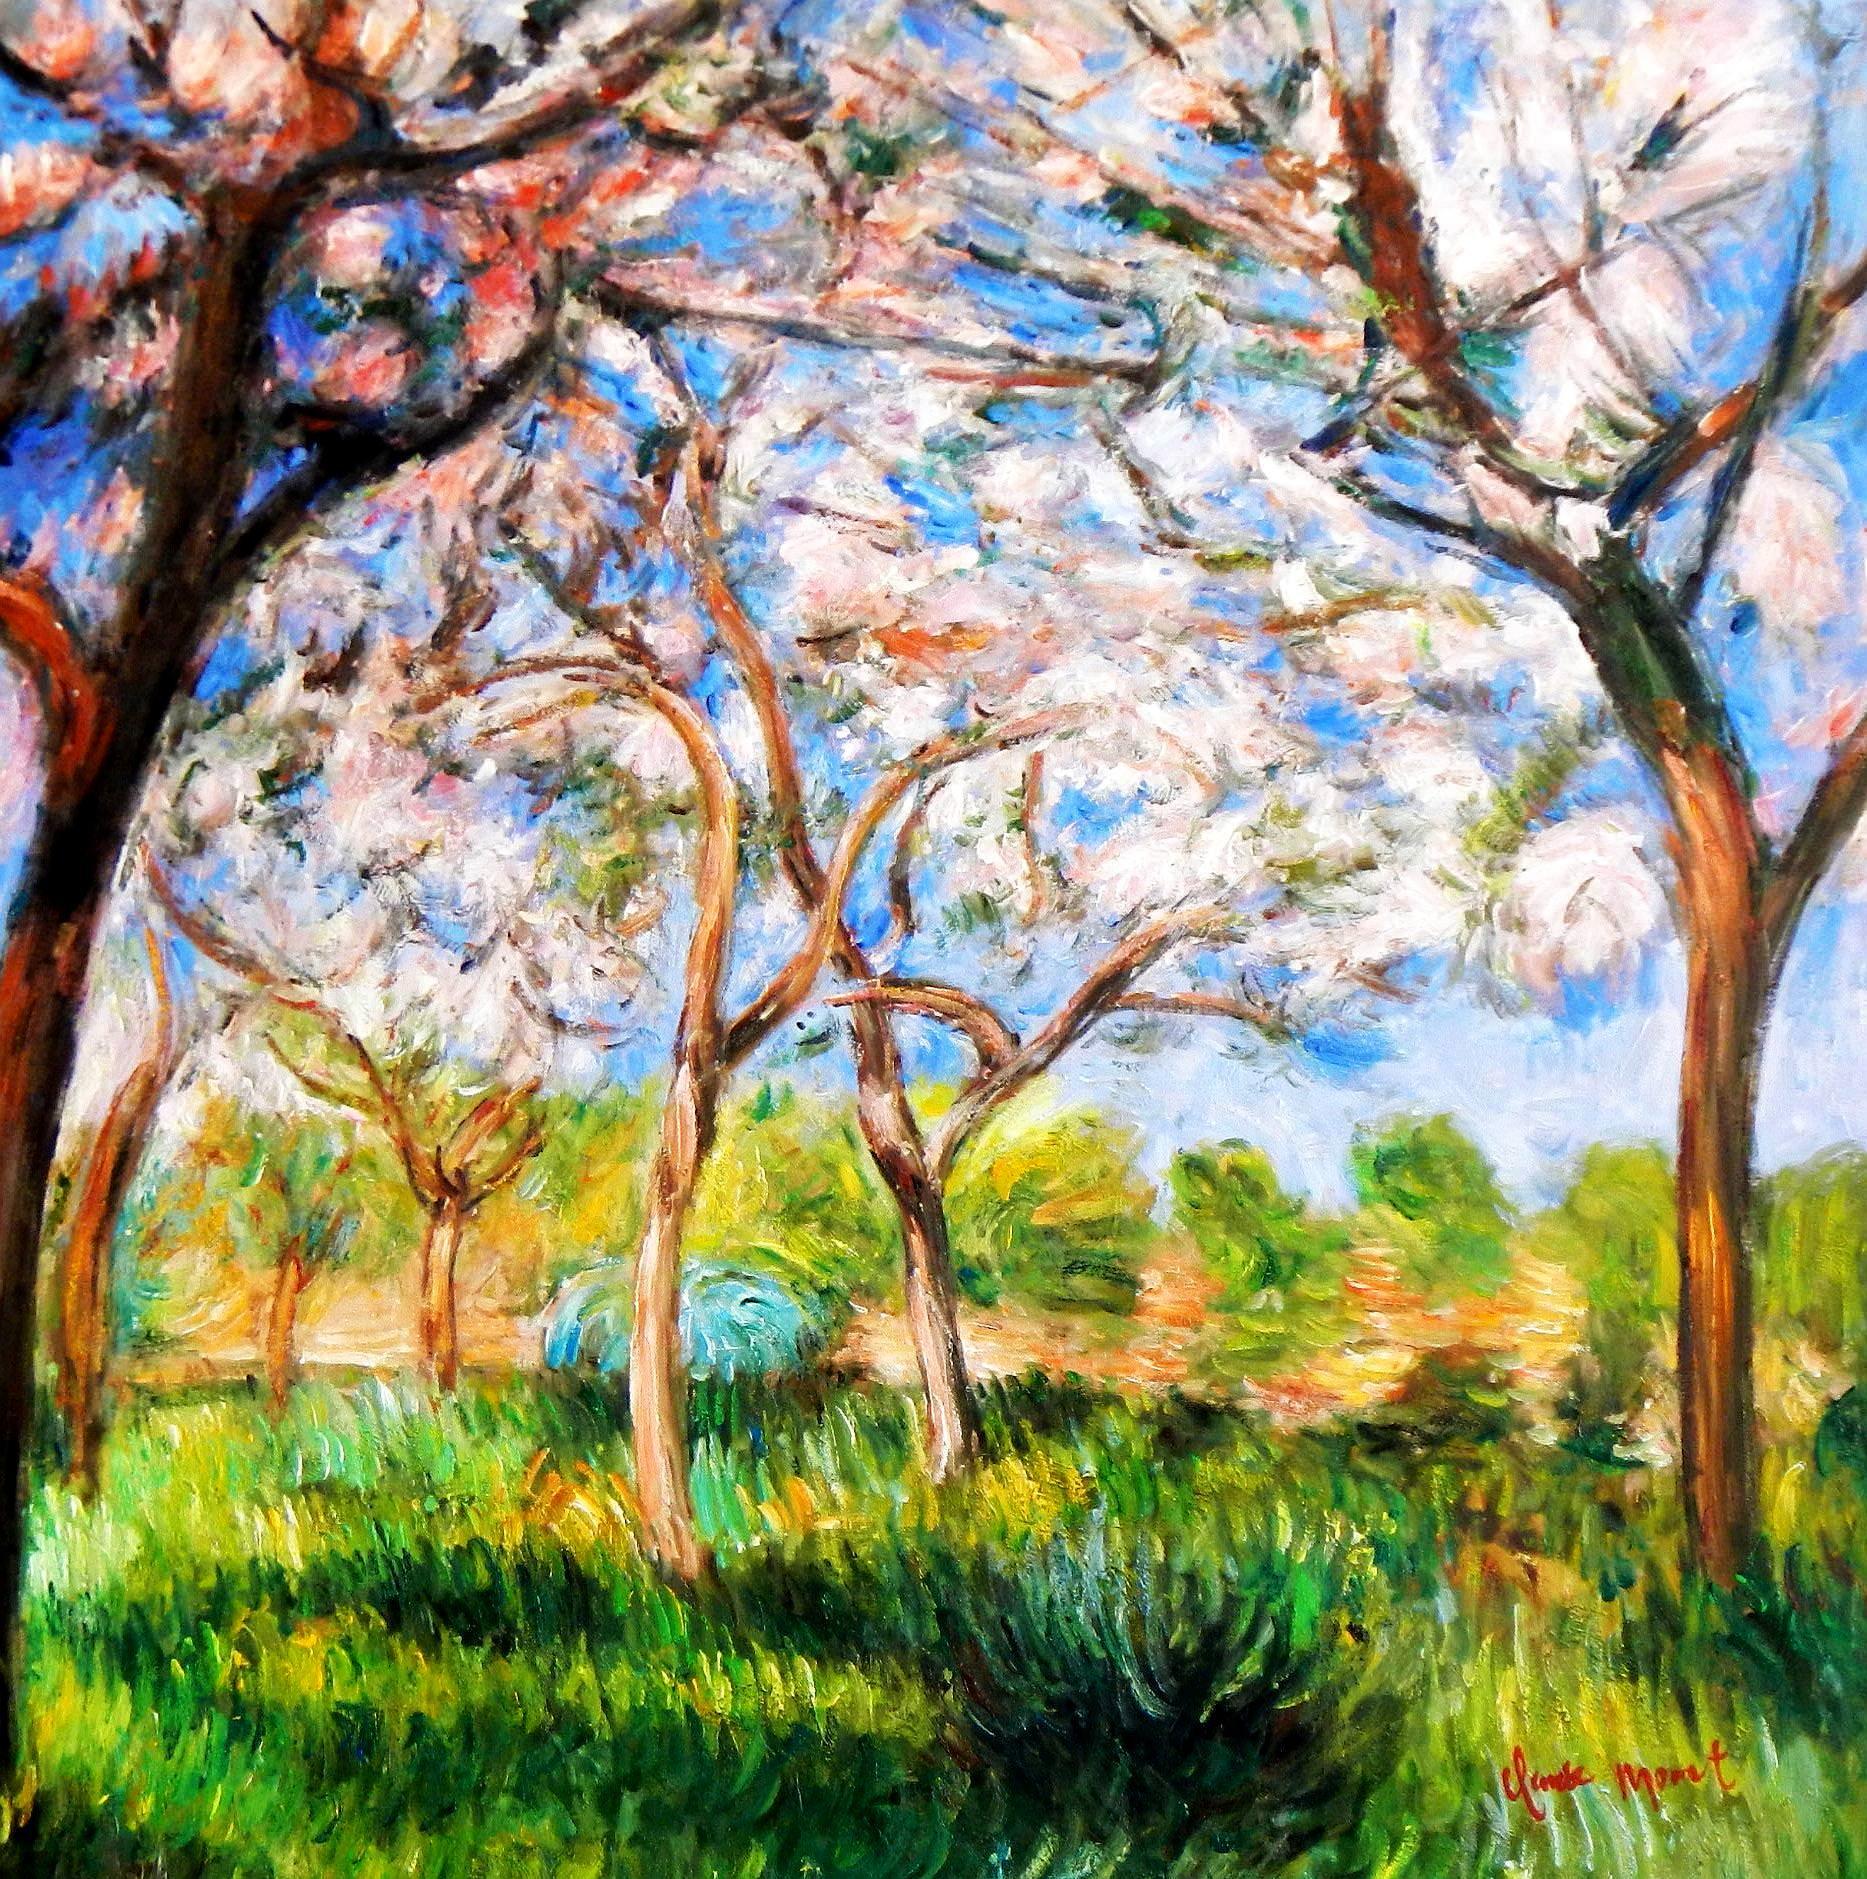 Claude Monet - Frühling in Giverny g94004 80x80cm exzellentes Ölgemälde